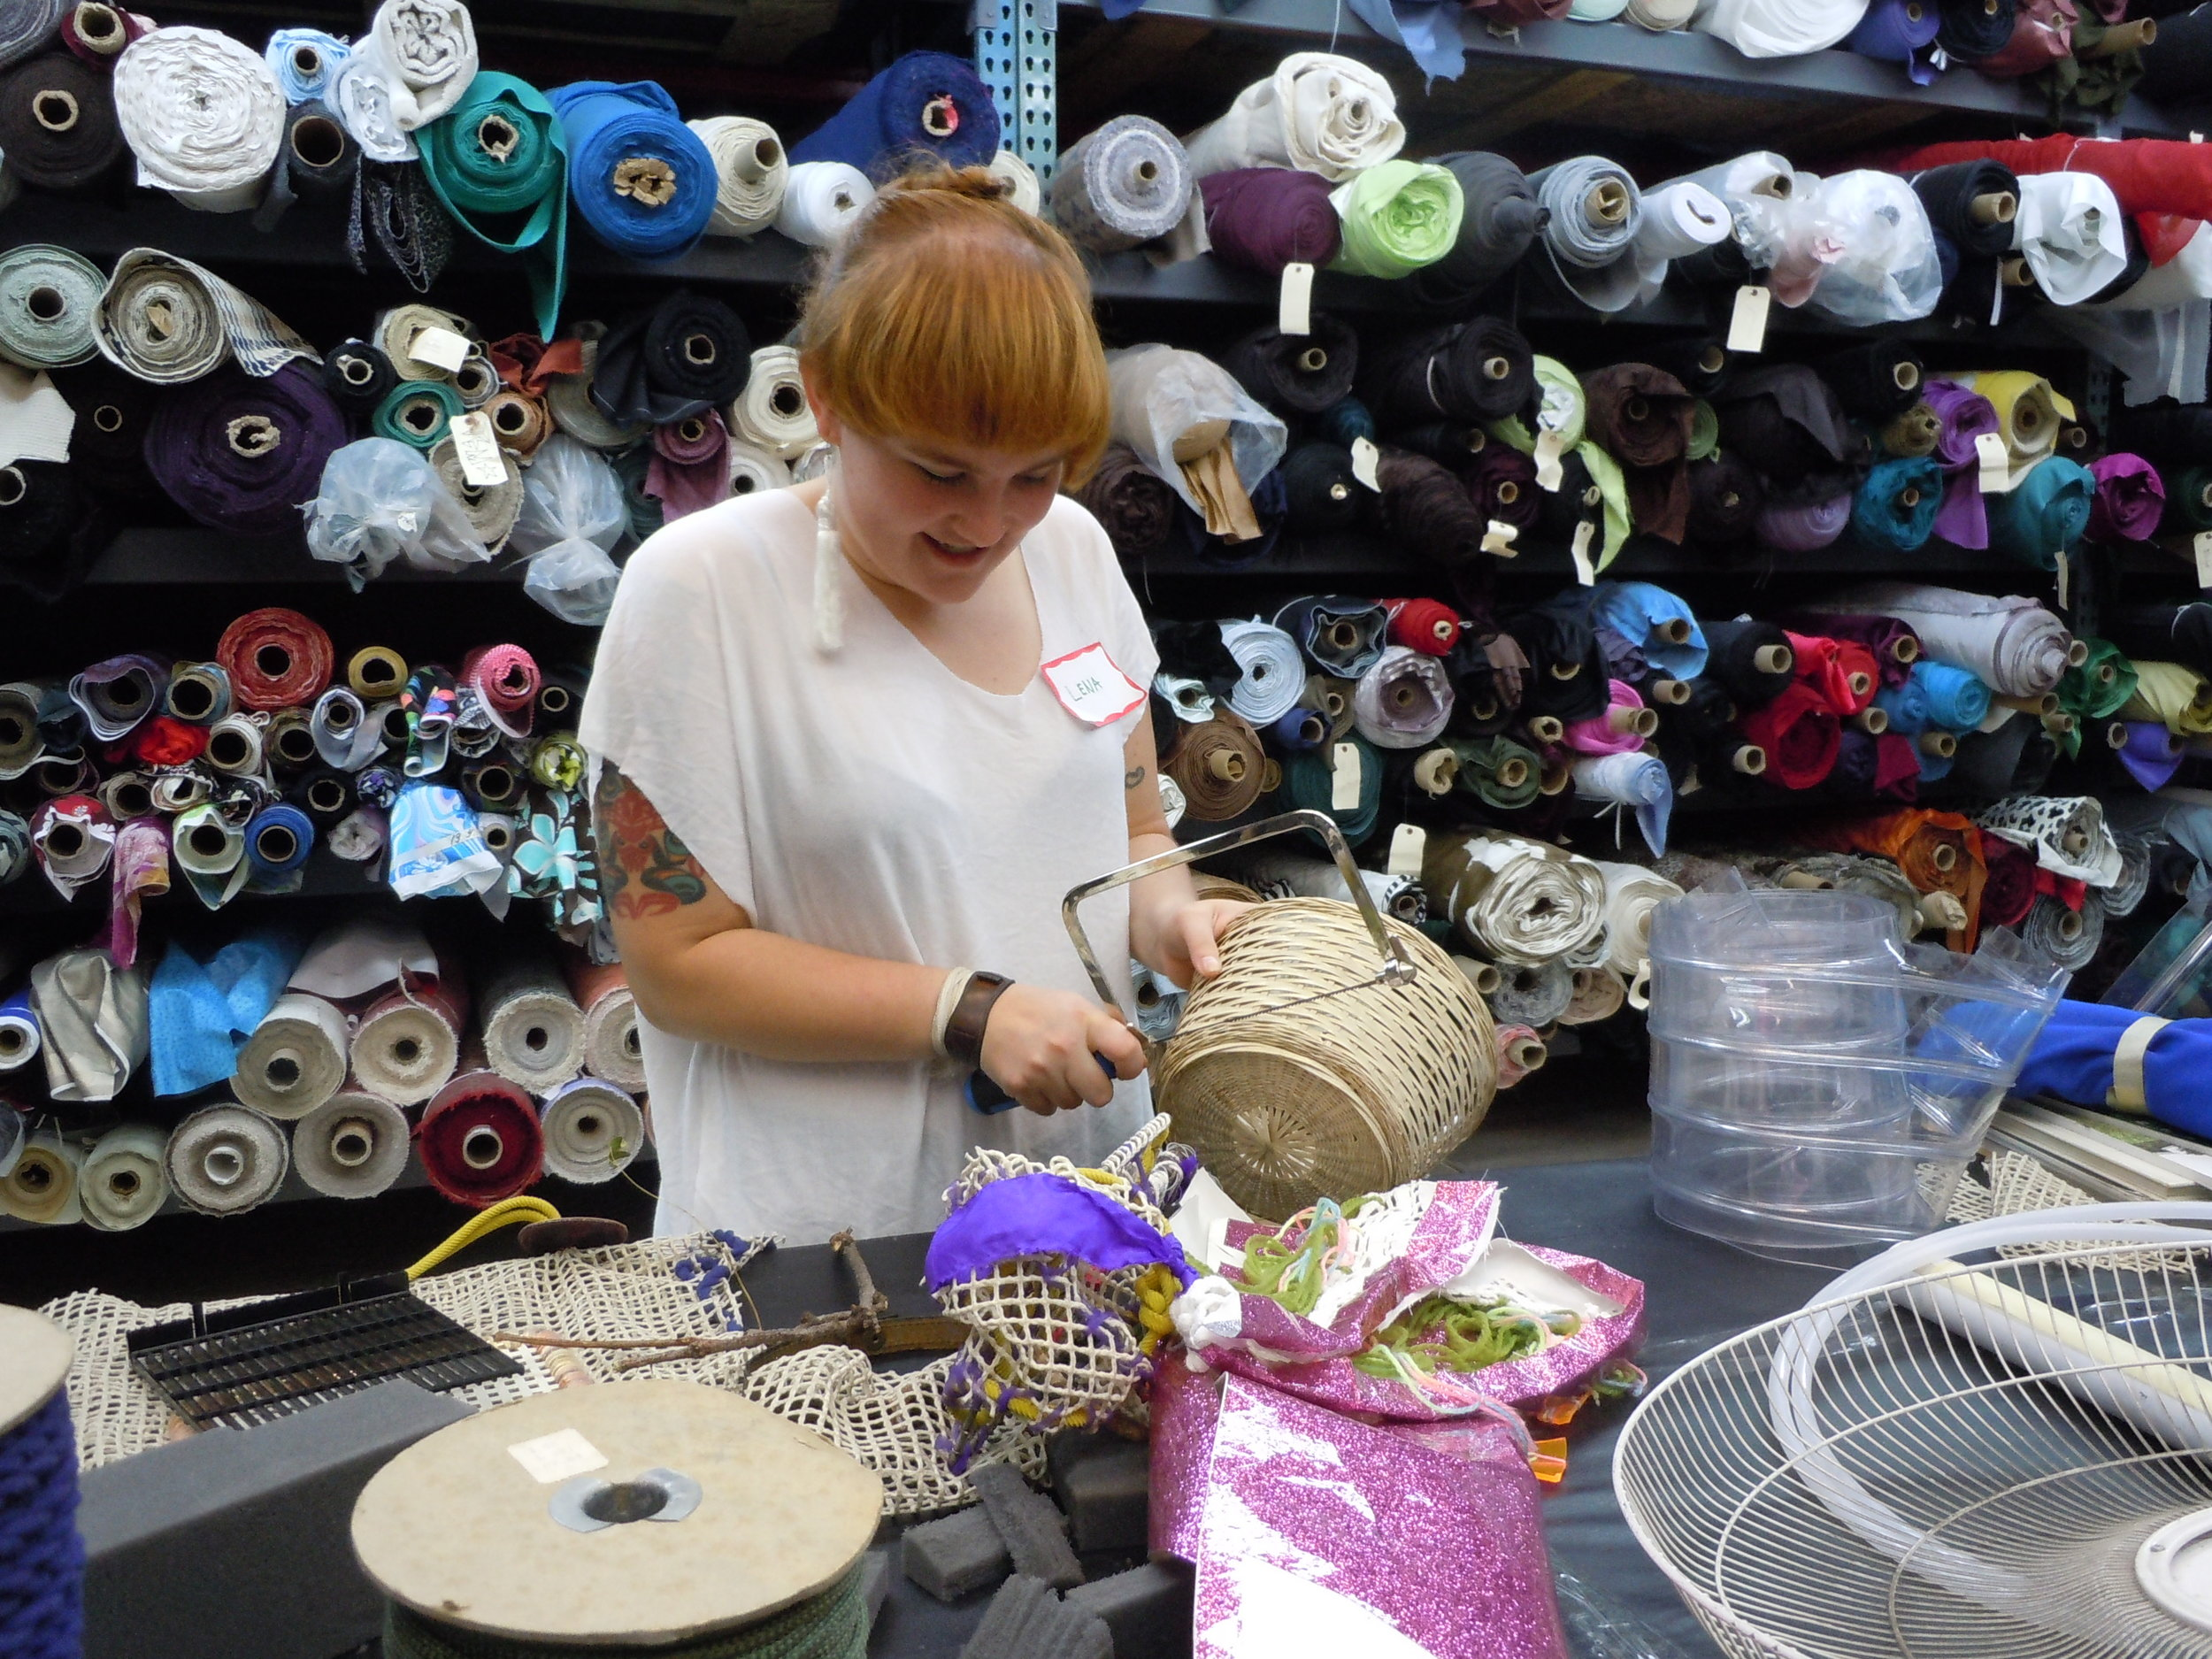 repurposing-a-basket_5063434305_o.jpg